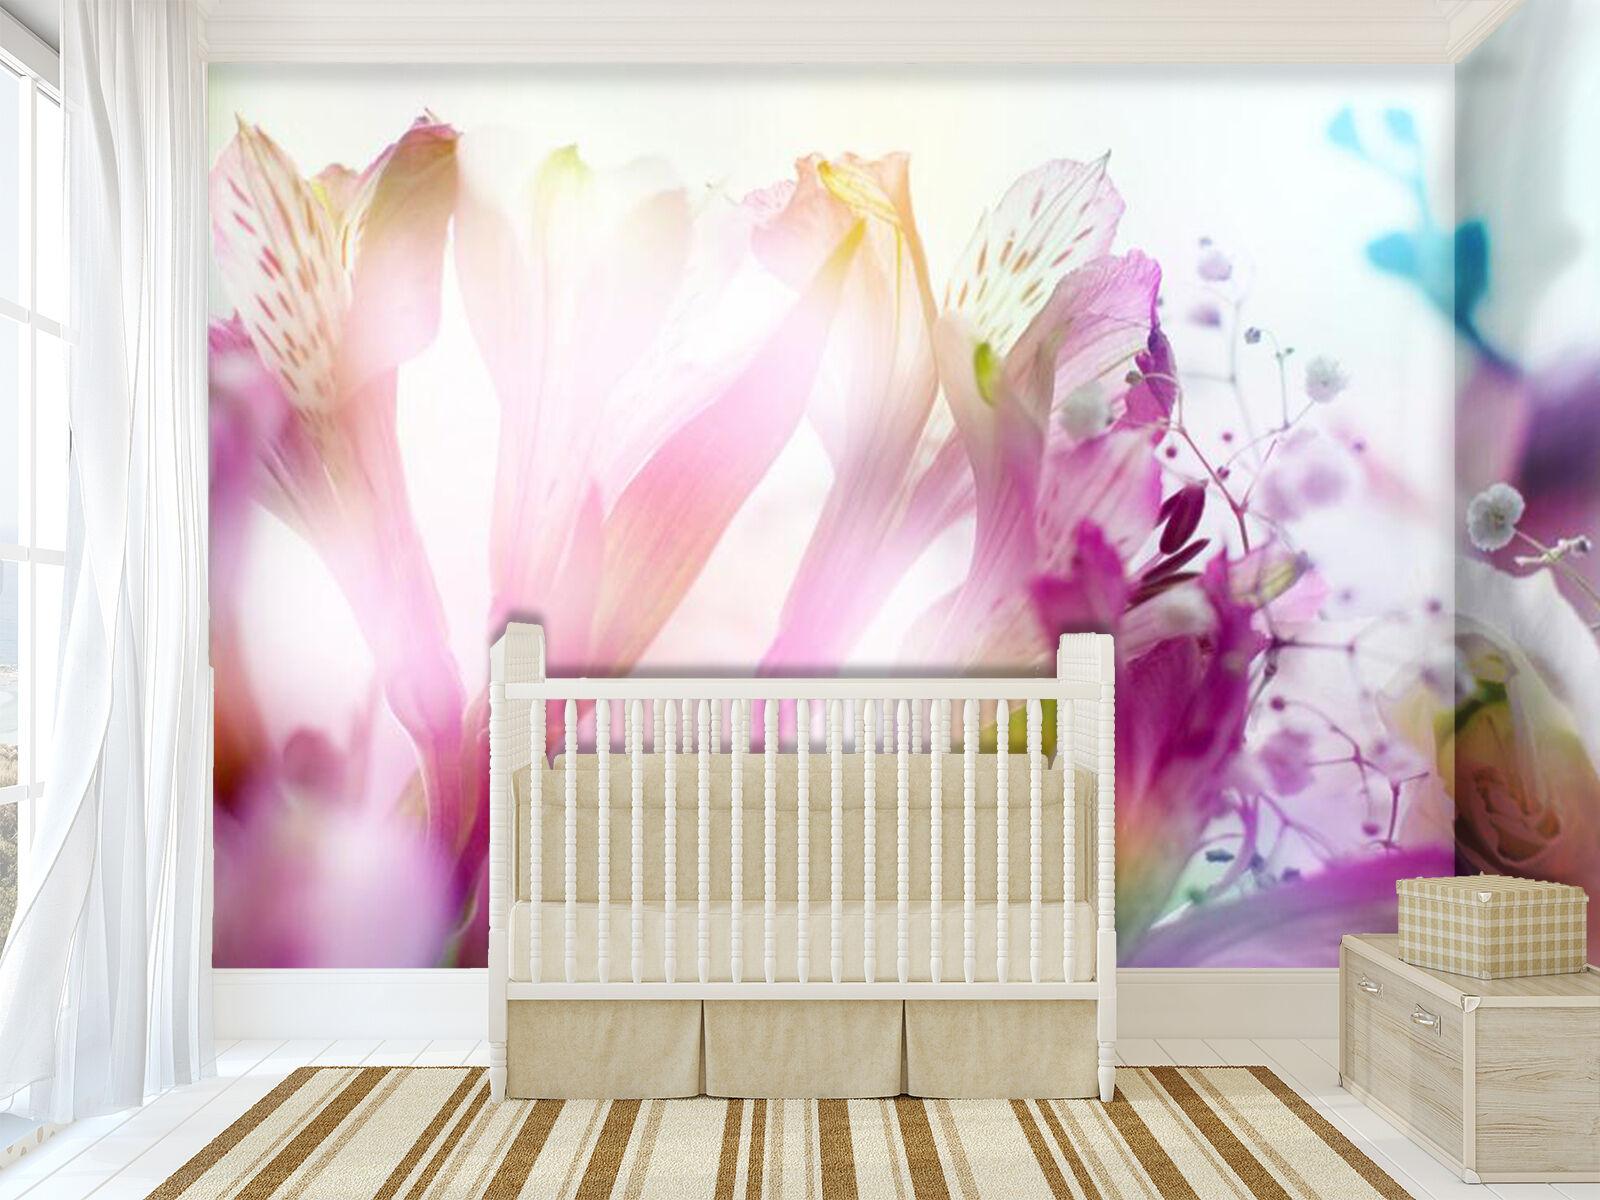 3D Fata Fiore 44 Parete Murale Foto Carta da parati immagine sfondo muro stampa